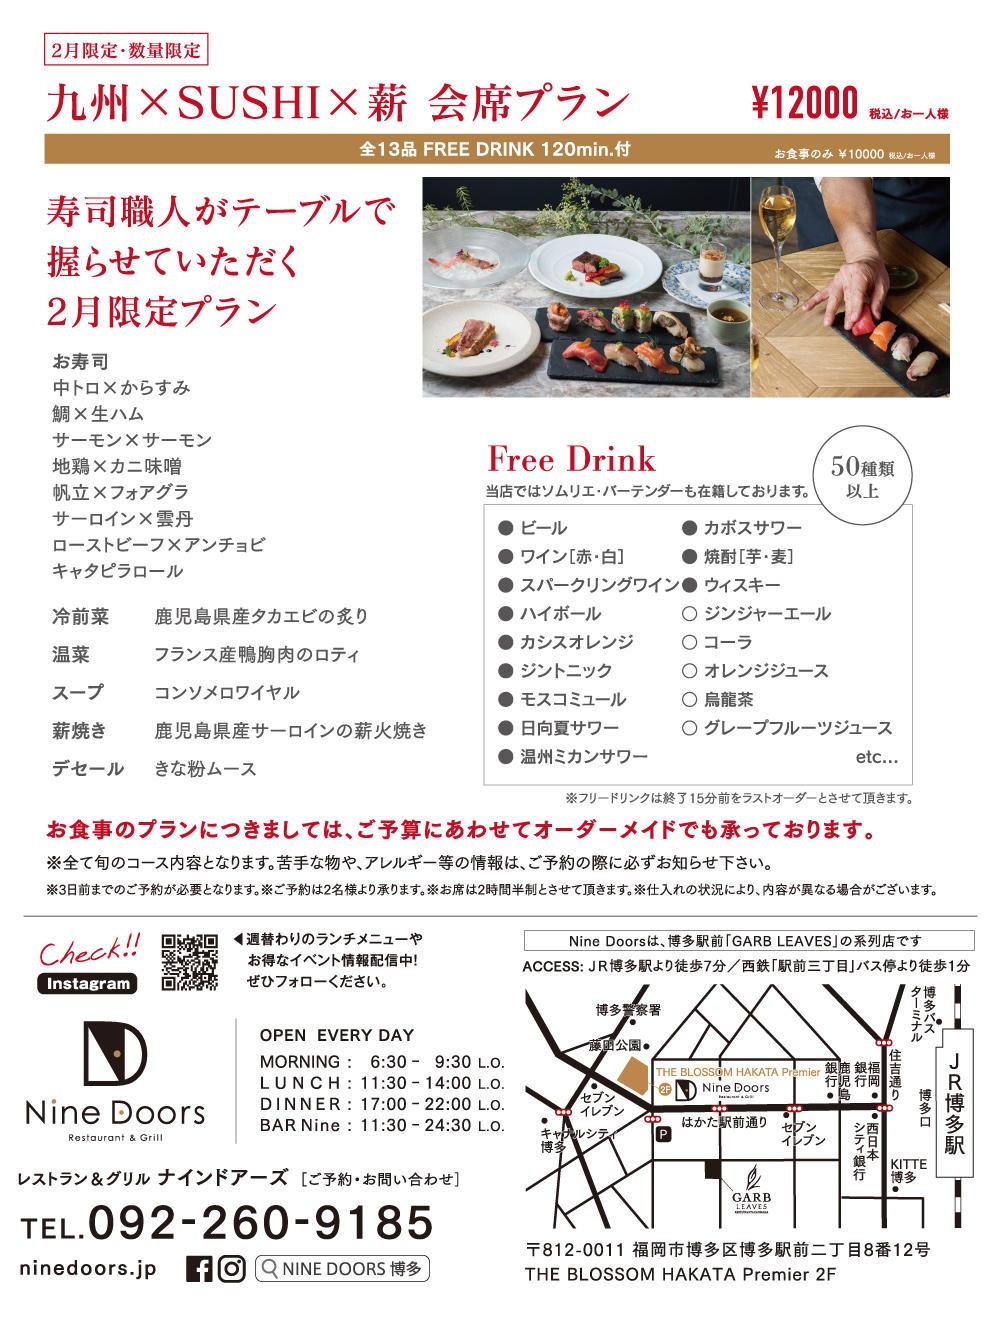 ND_200122_02party_sushi_1000B.jpg